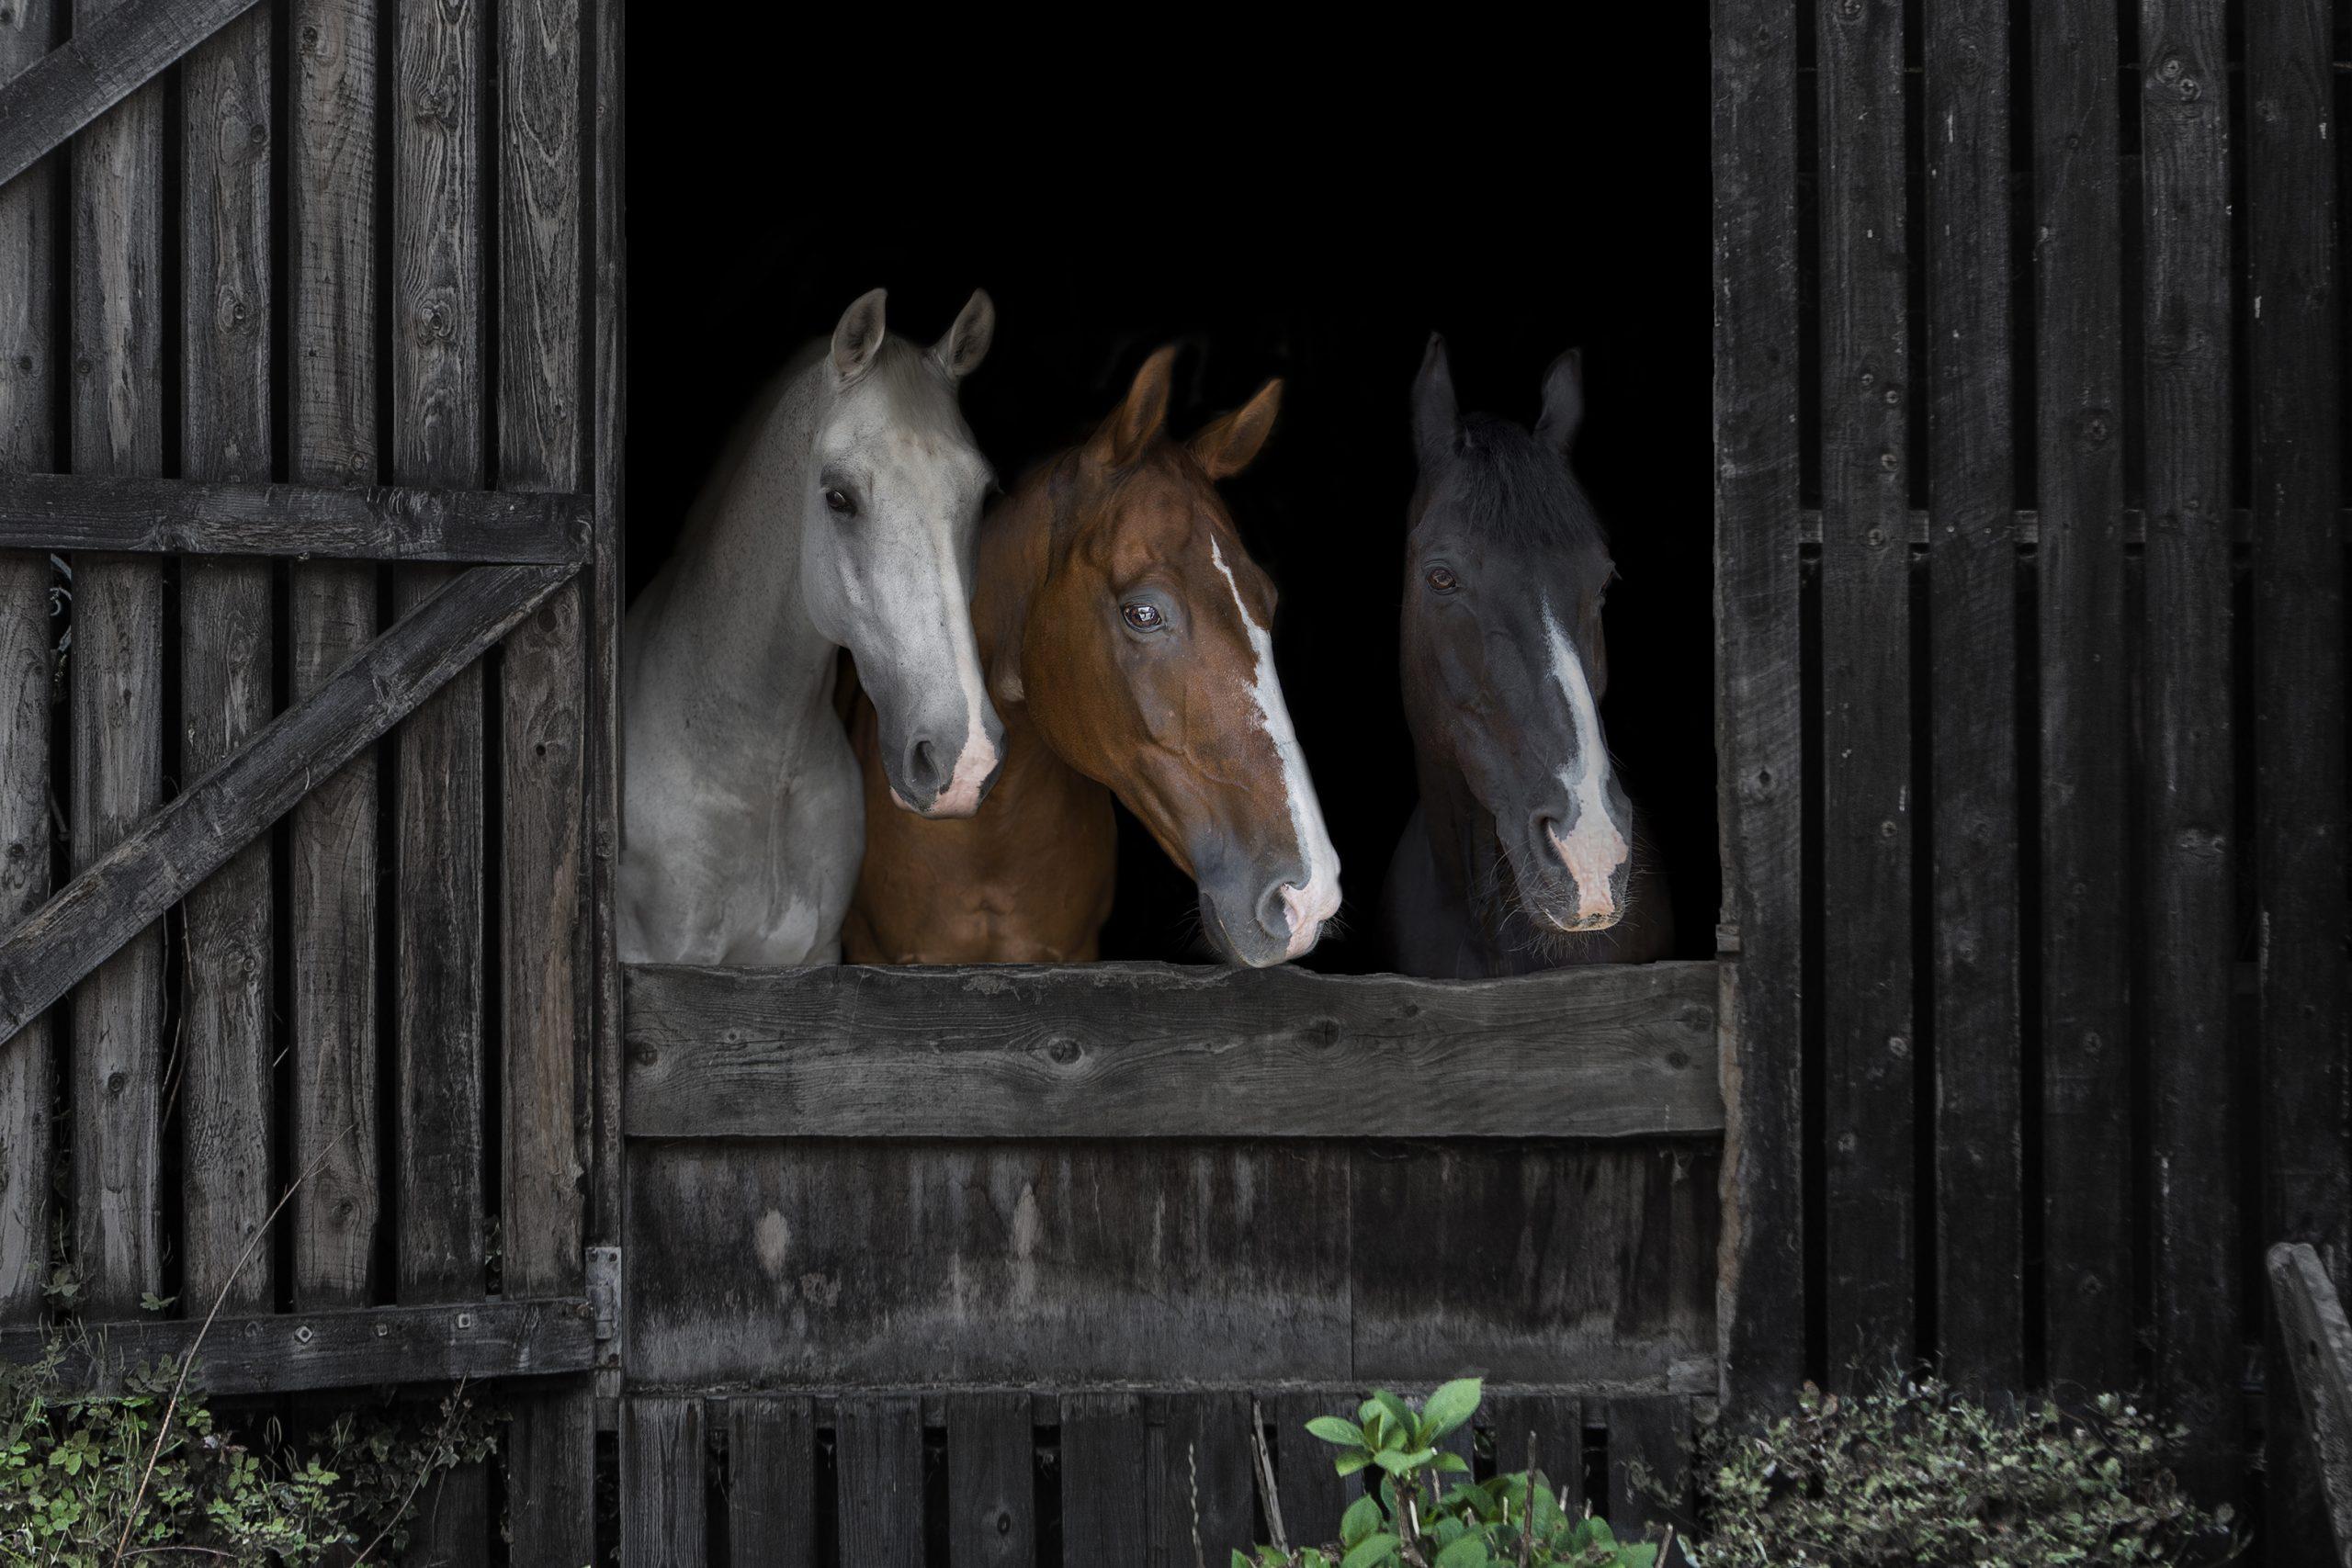 Emma Lowe Horse Photography – Nemo, Uno & Reble